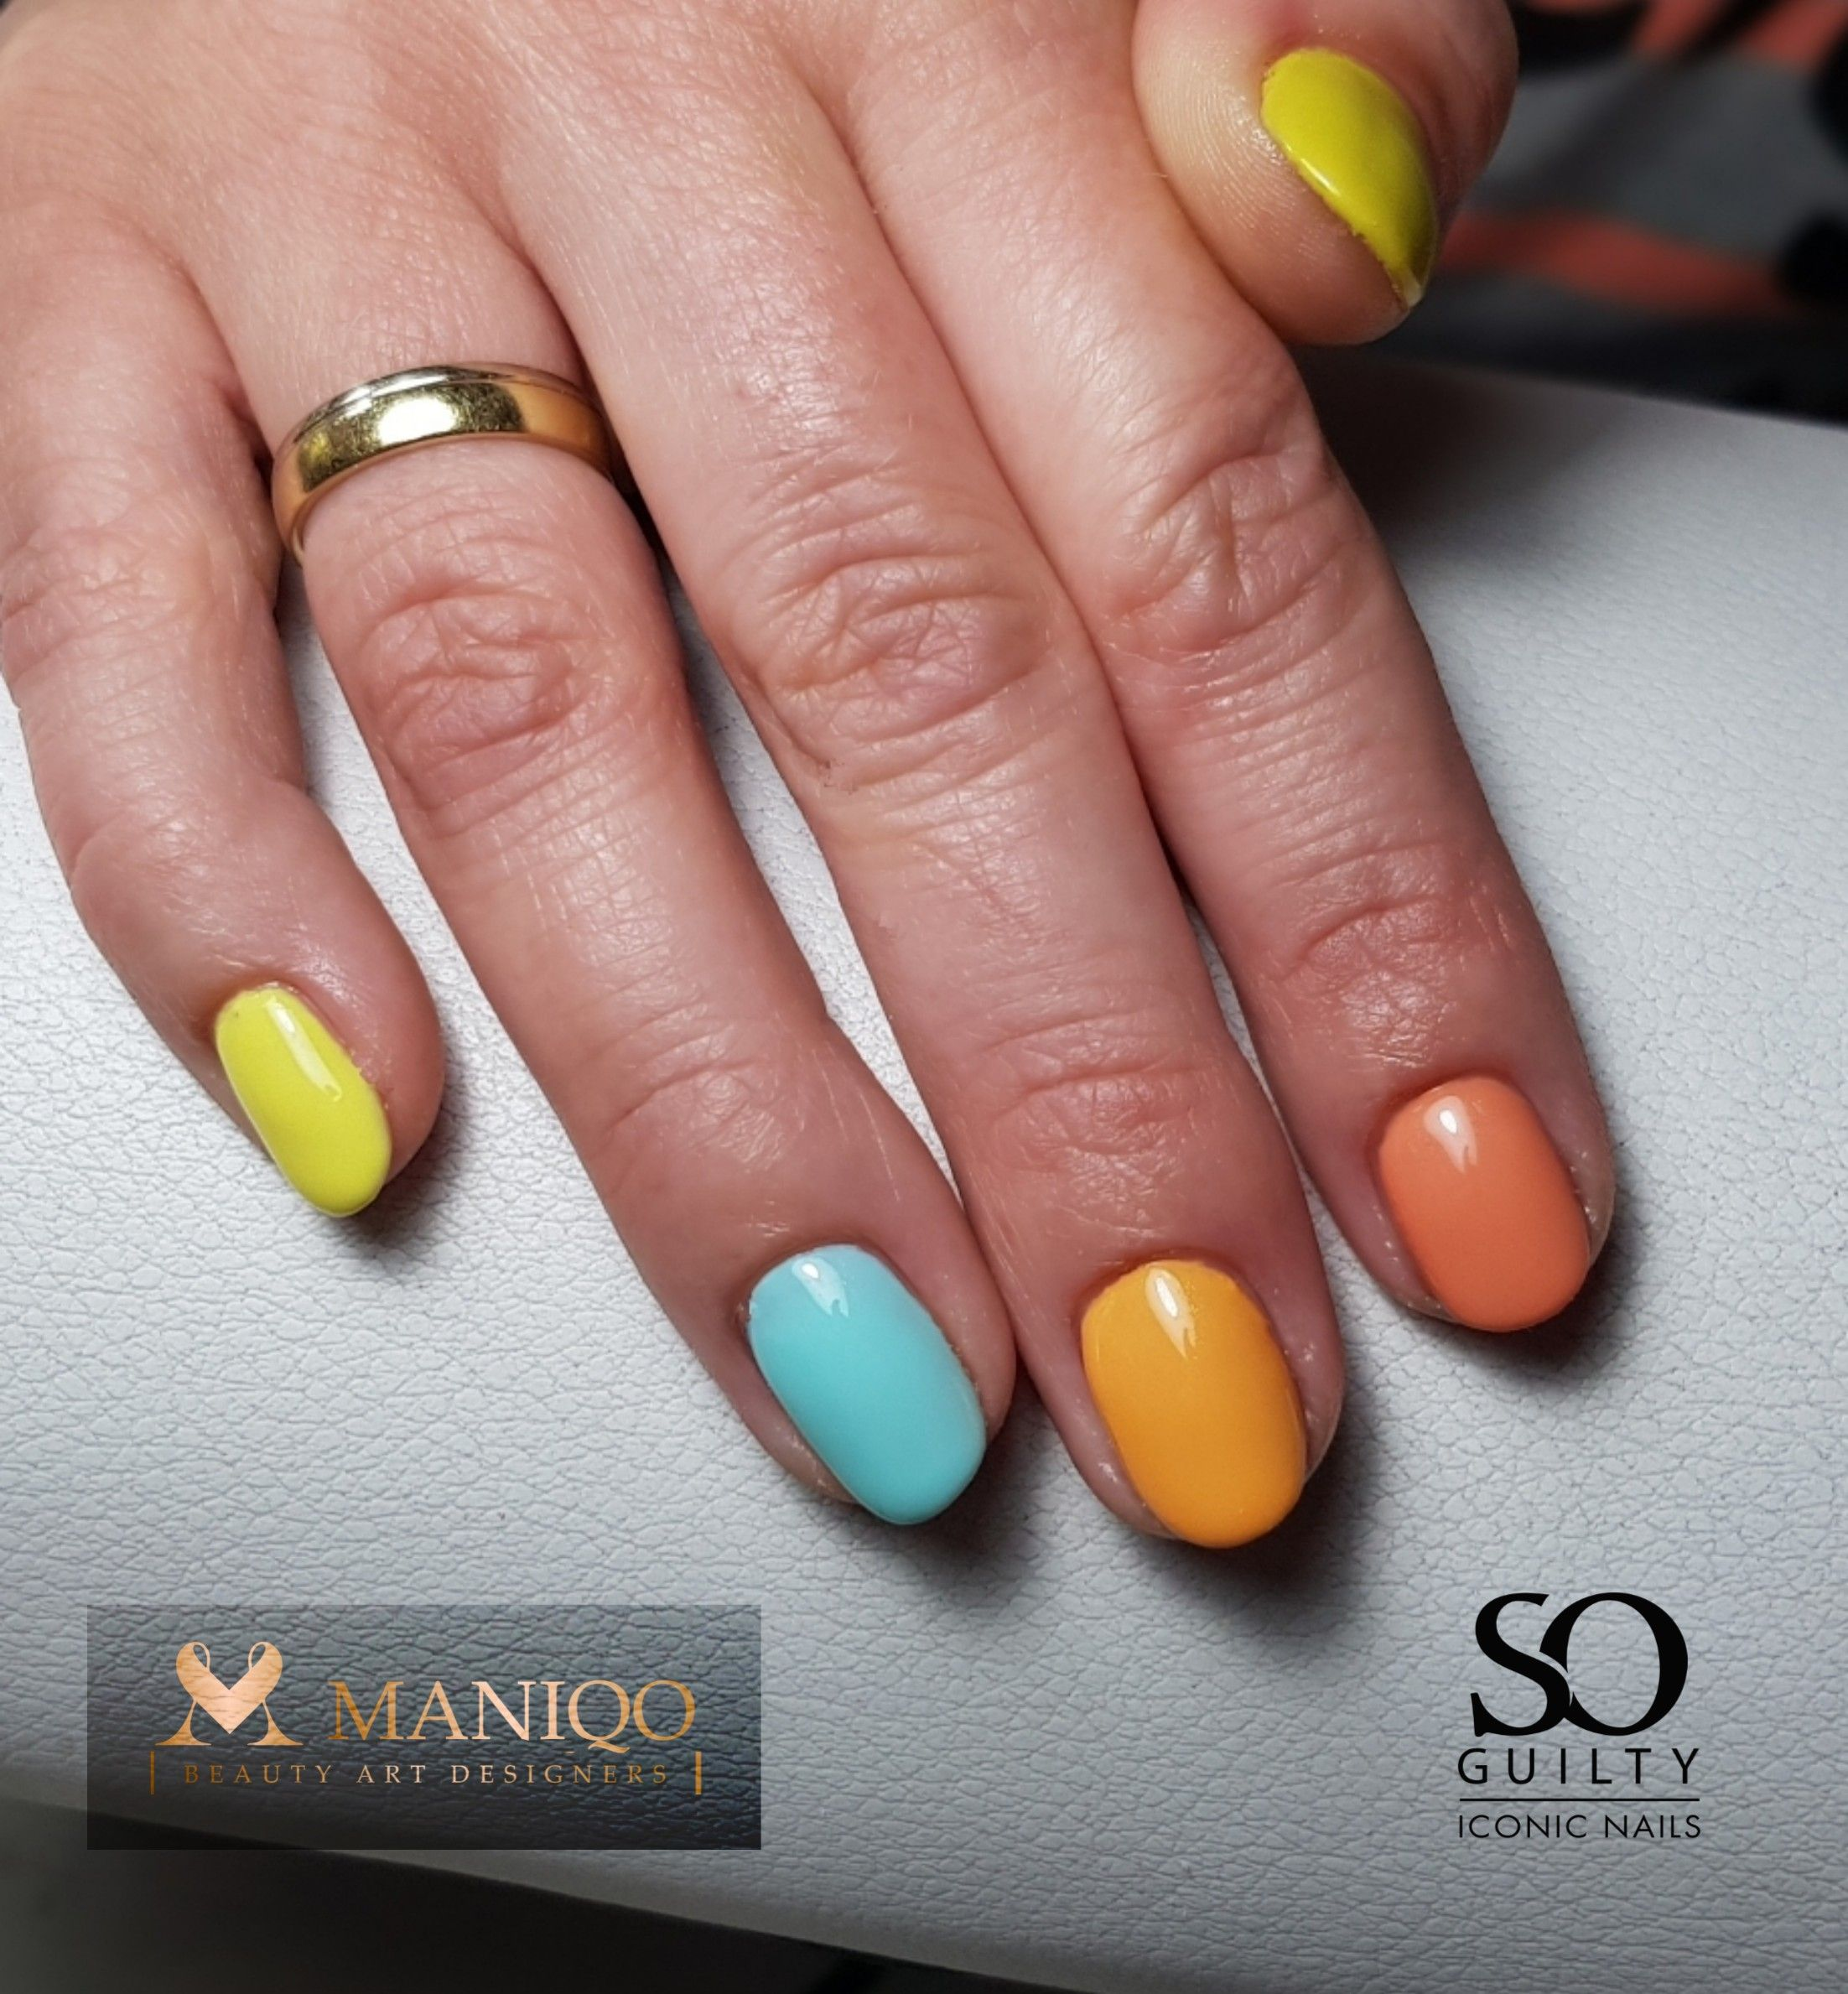 Rainbow Nails In 2020 Visagie Nagels Kapper